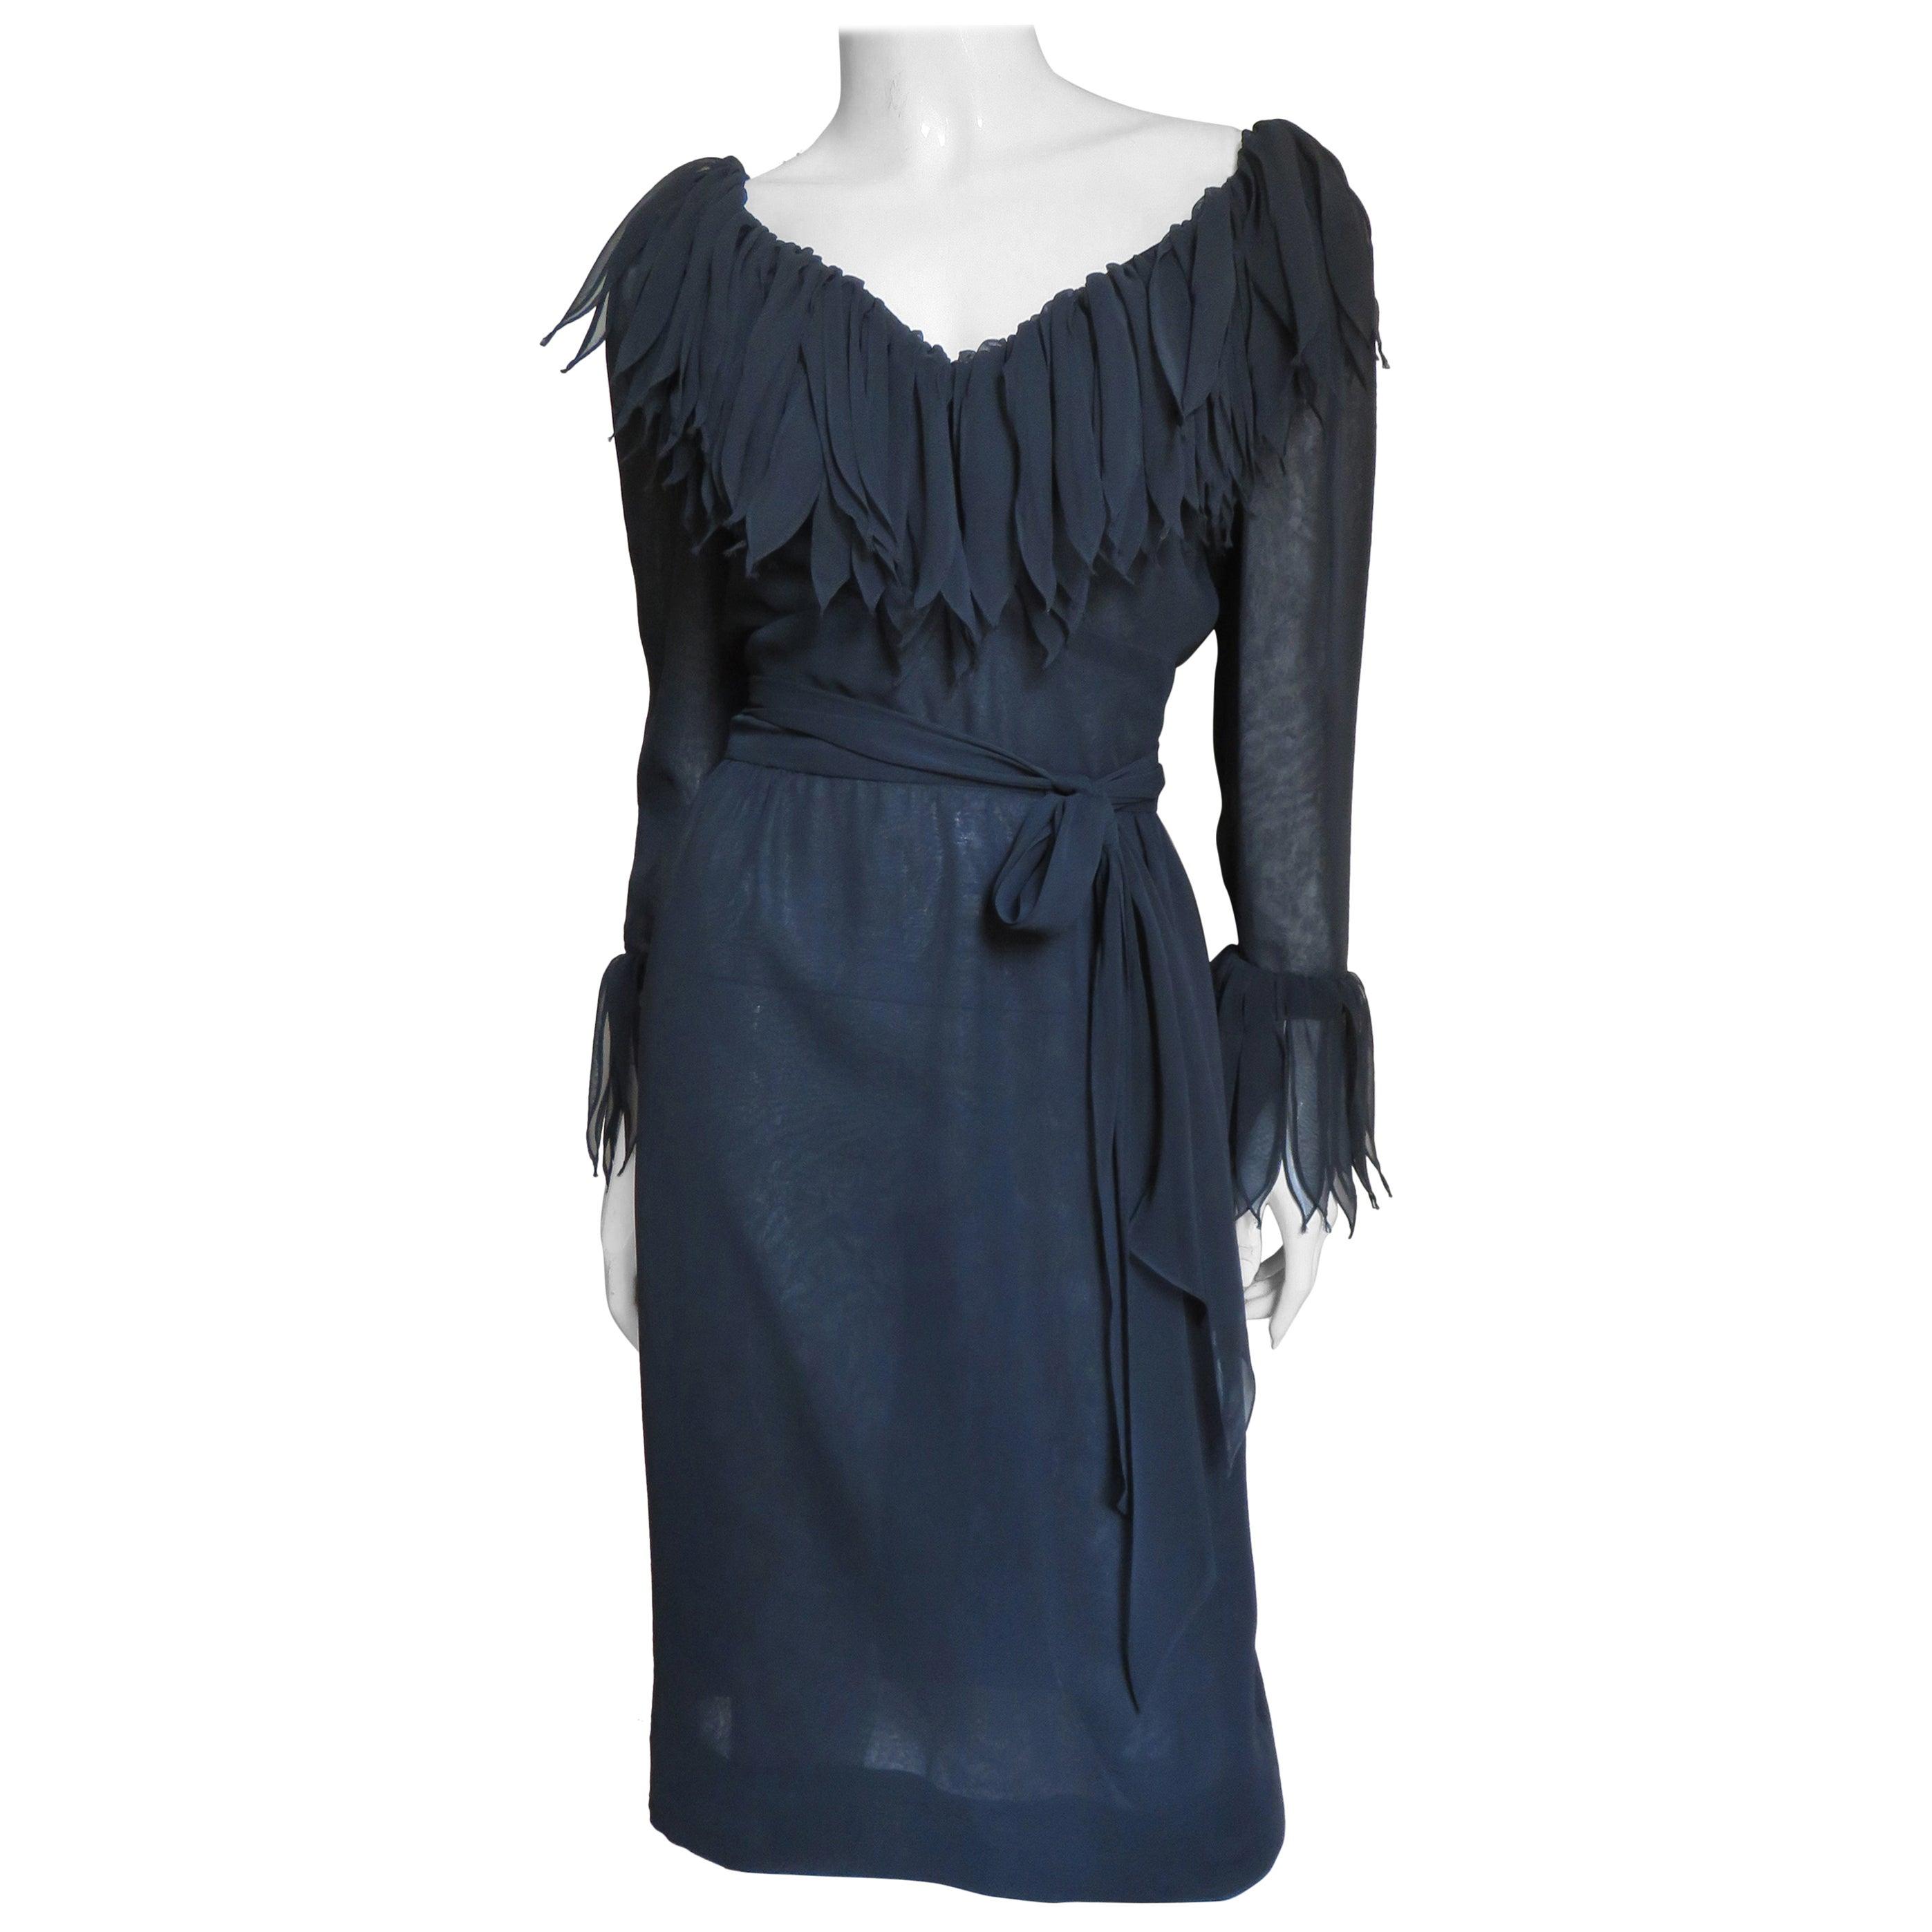 Travilla Silk Applique Dress 1970s